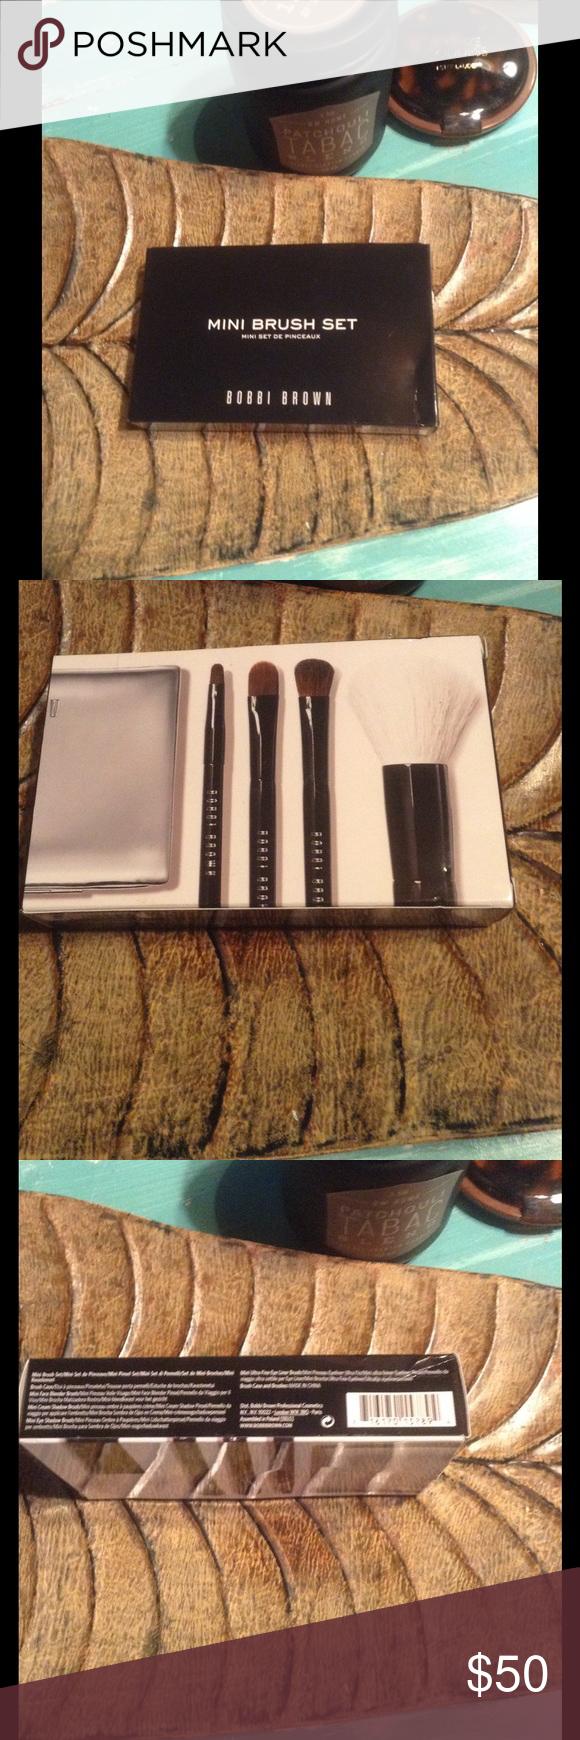 Bobbi brown elegant mini brush set !firm on price! nwt